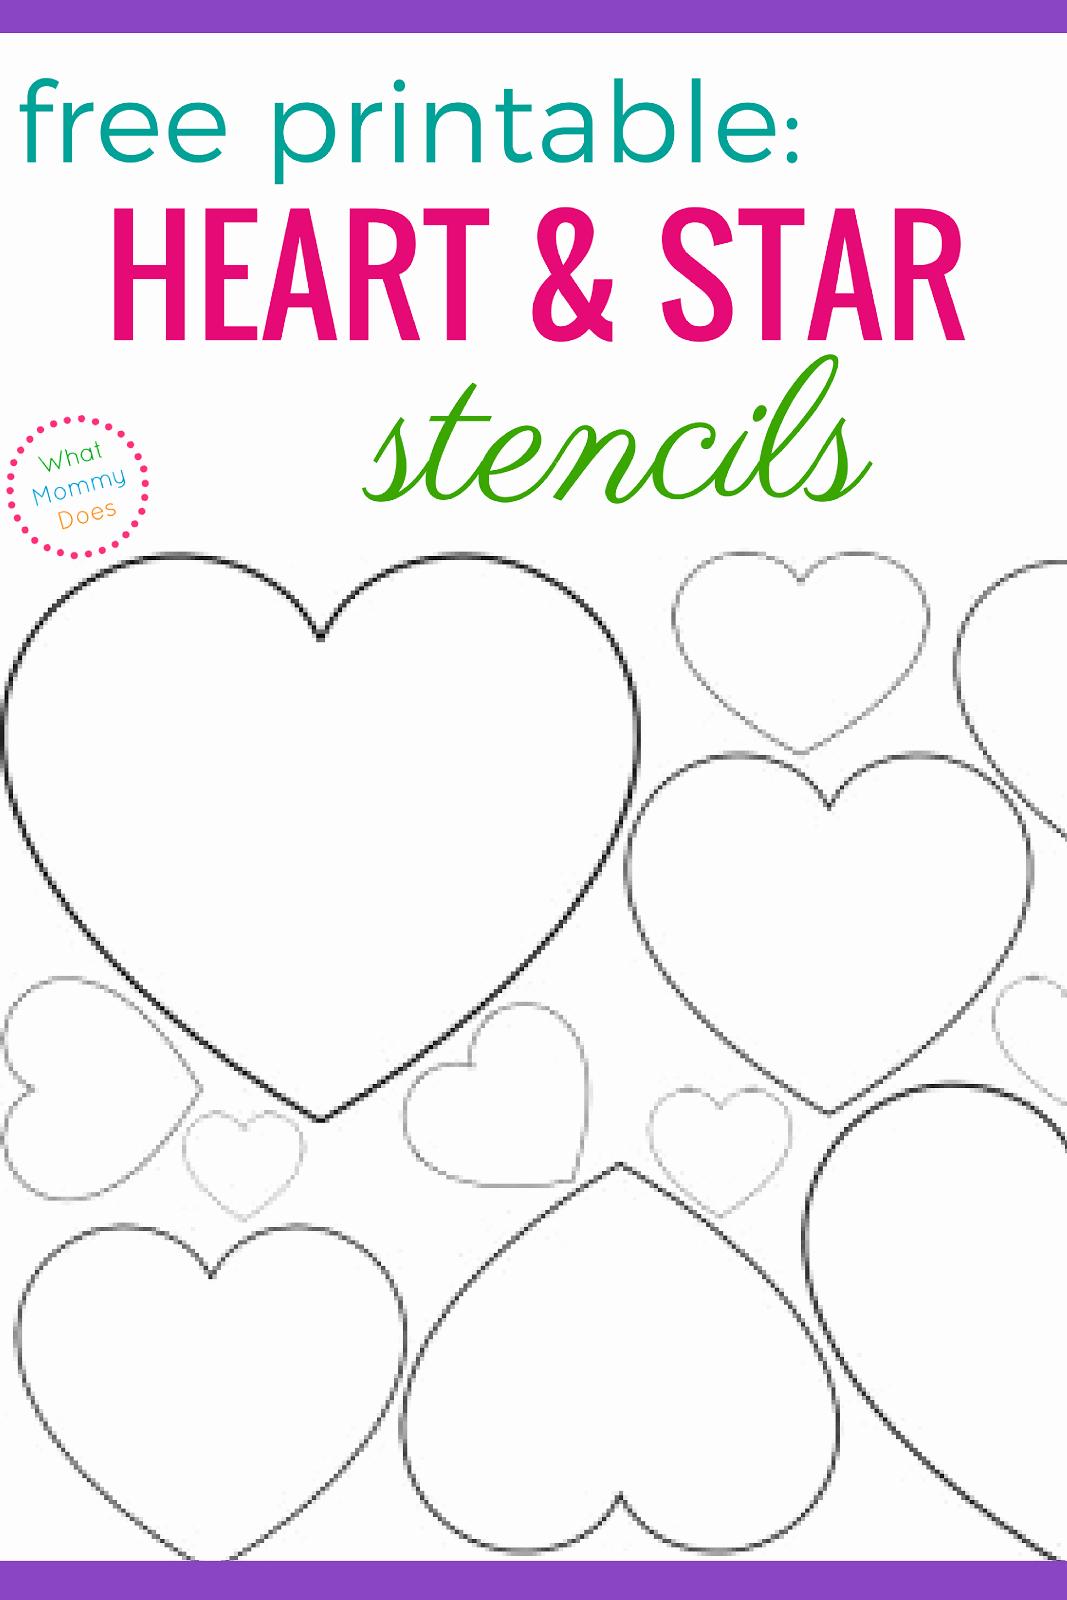 Star Stencil Printable Inspirational Free Printable Heart Stencils & Star Templates